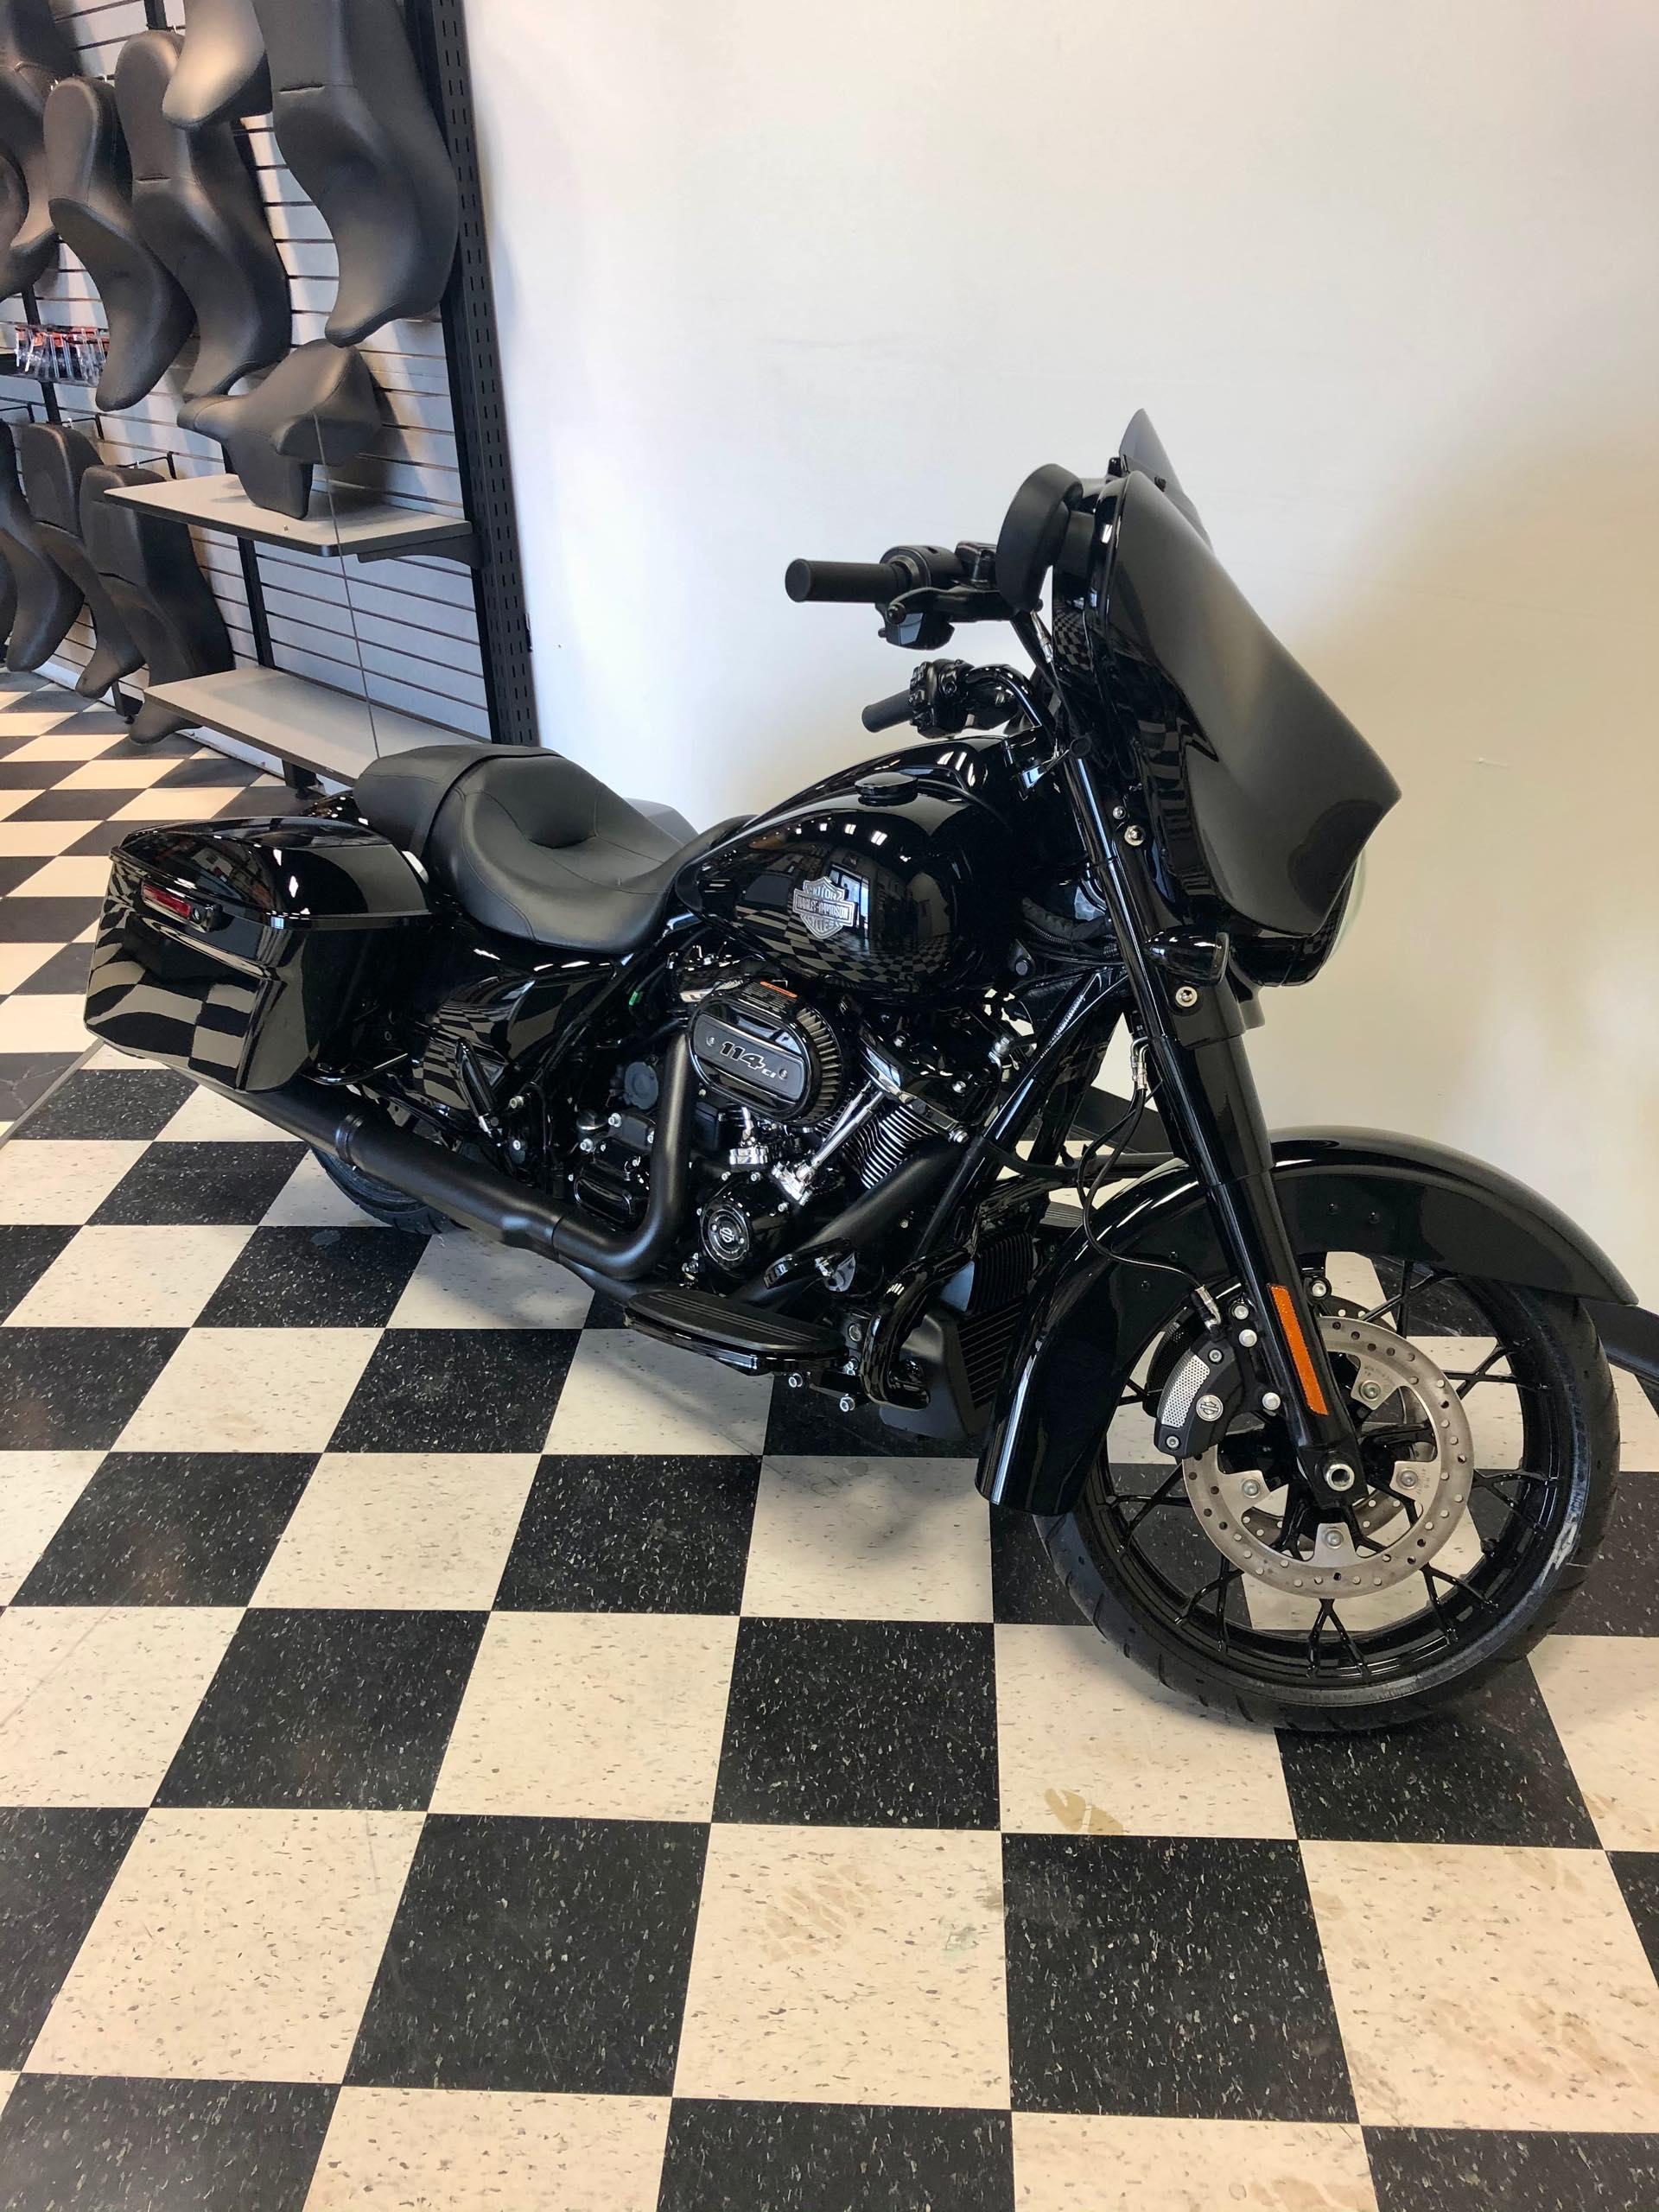 2021 Harley-Davidson Touring Street Glide Special at Deluxe Harley Davidson